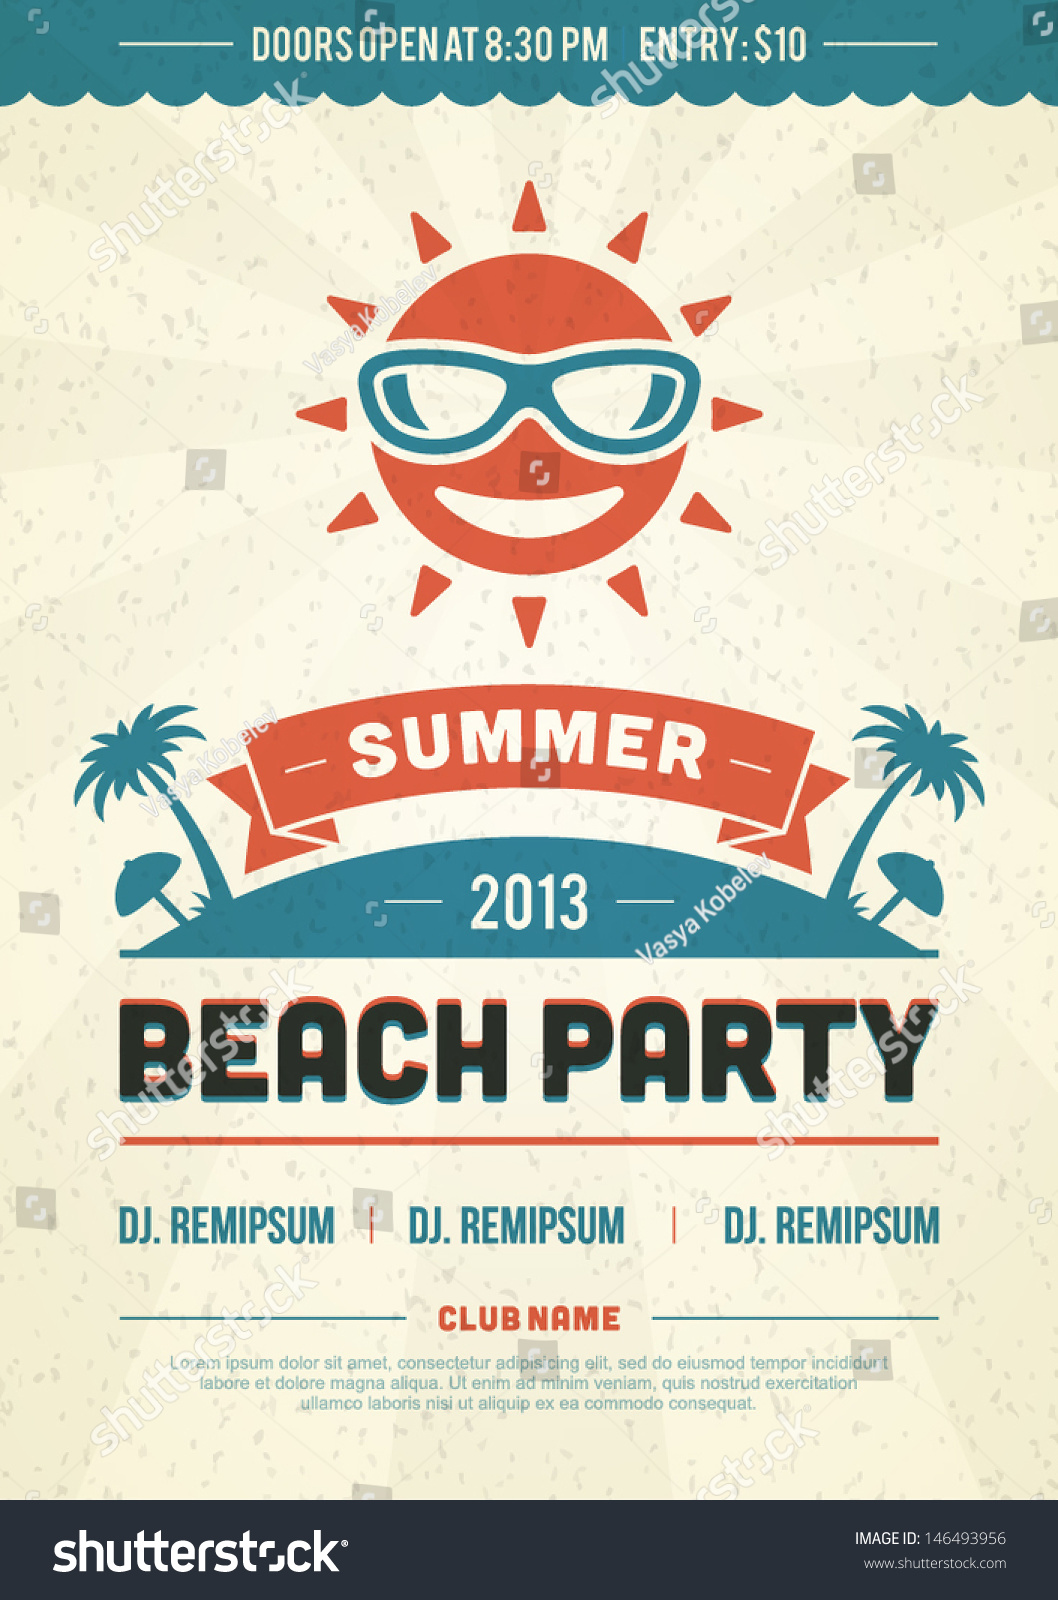 retro summer party design poster flyer stock vector 146493956 shutterstock